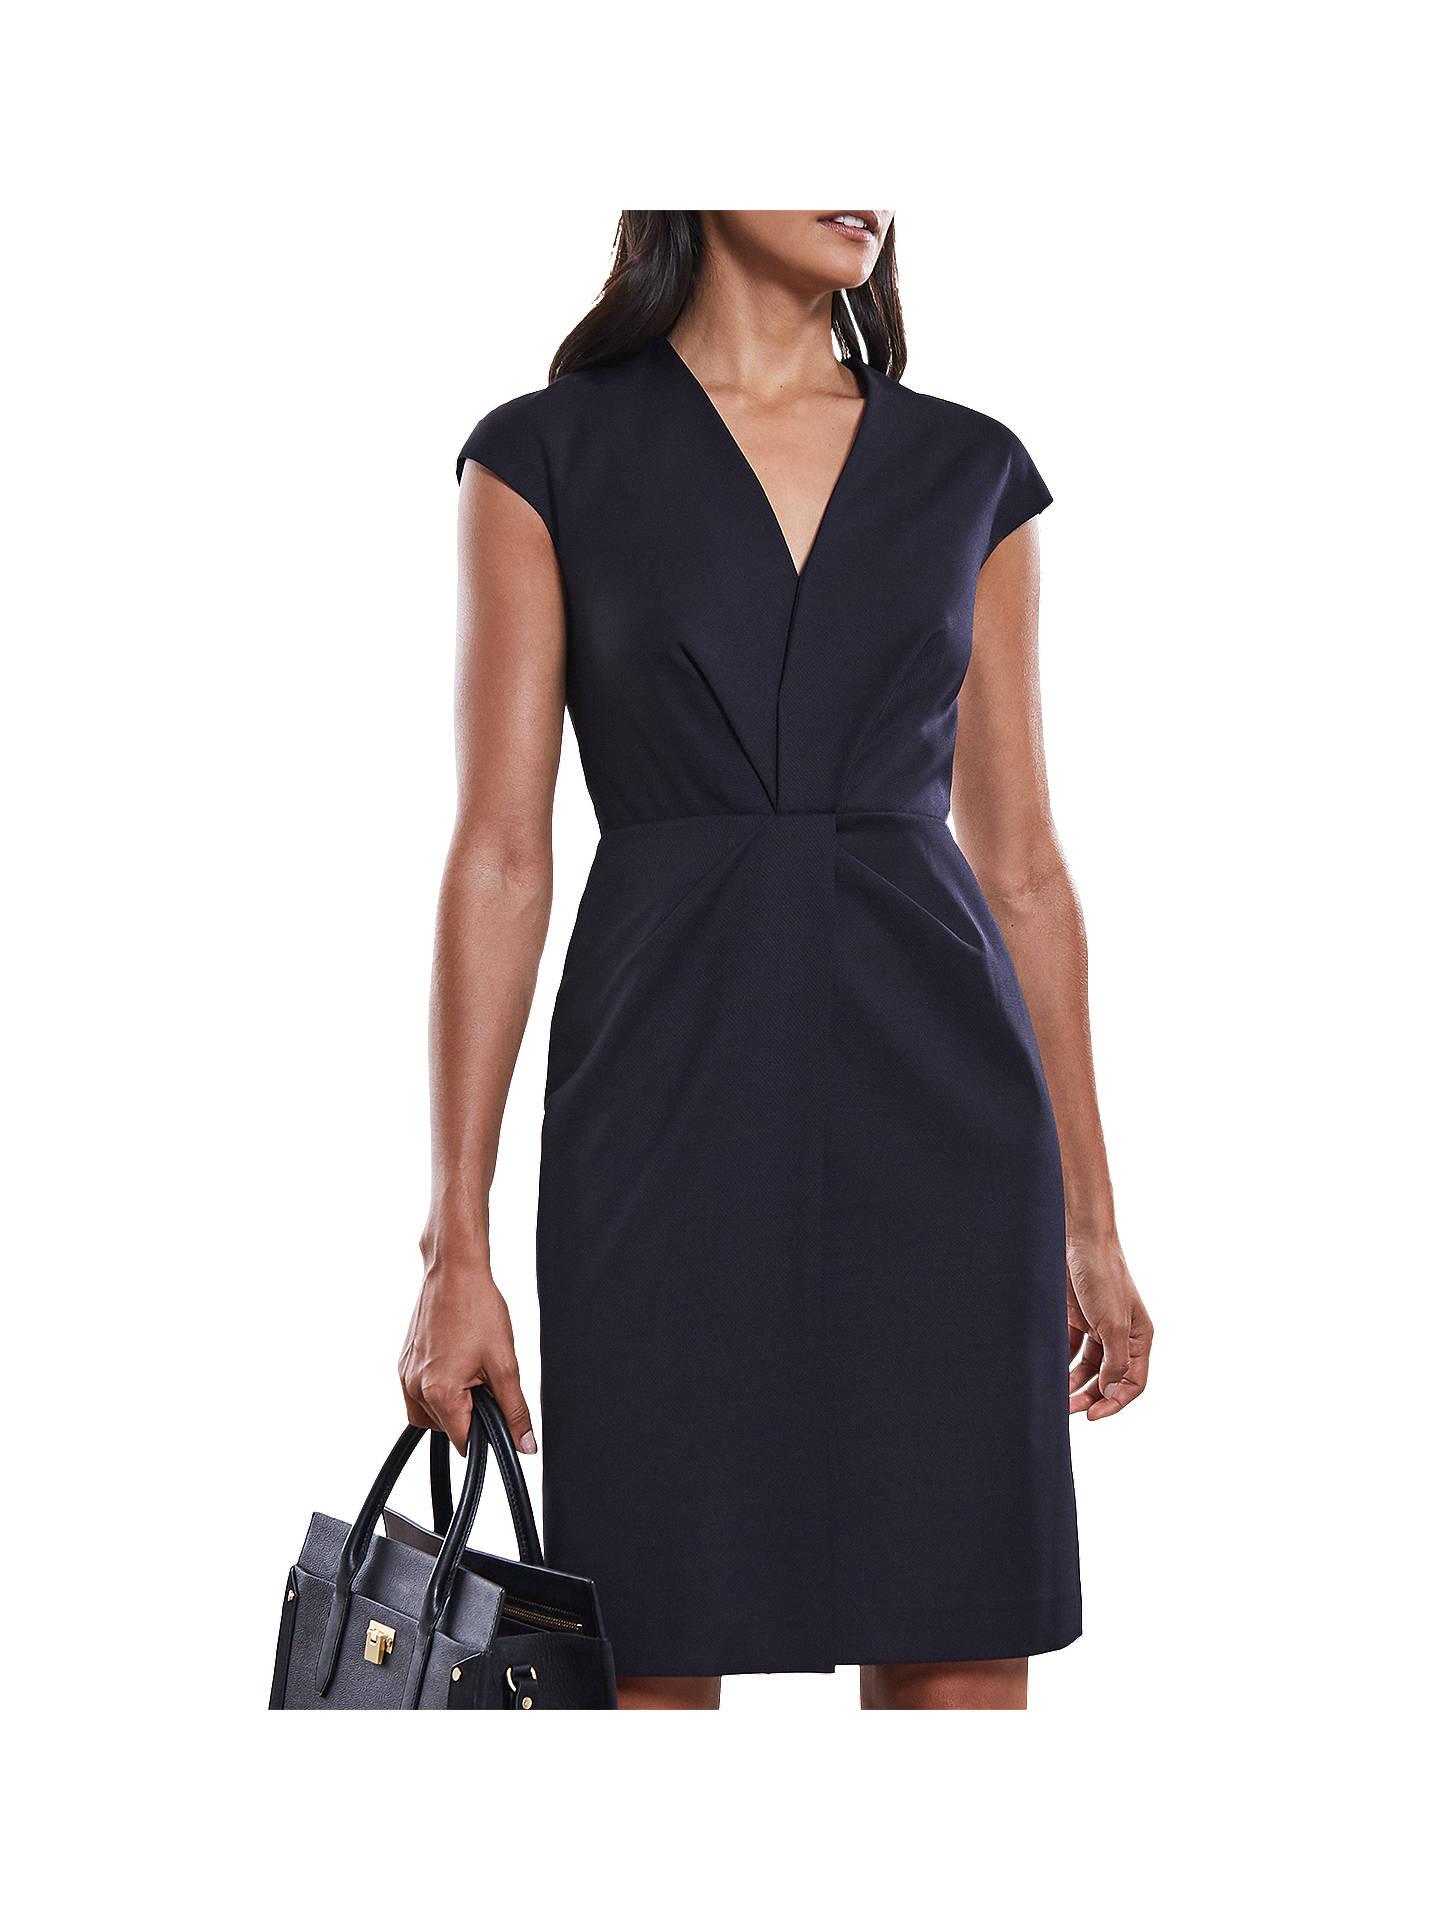 6125a4973e9 Buy Reiss Fenton Tailored Wrap Bodice Dress